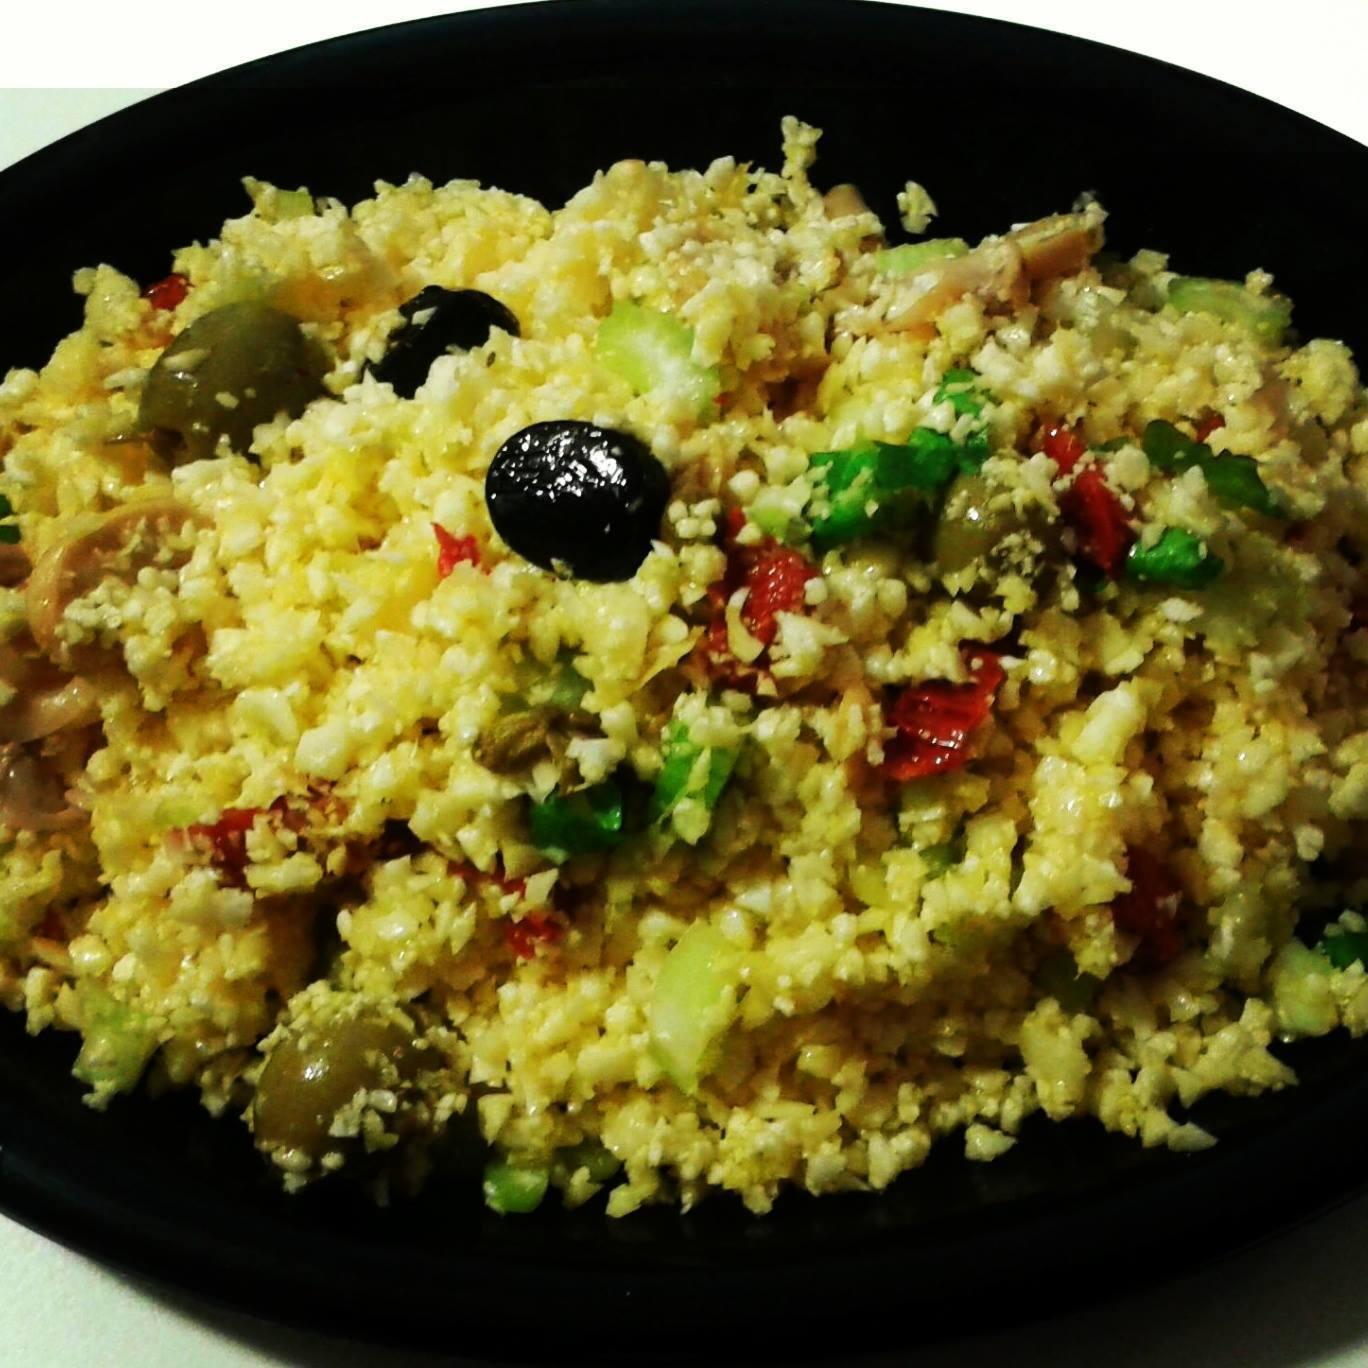 Rubrica di cucina cous cous senza cous cous - Cucina senza fornelli ...